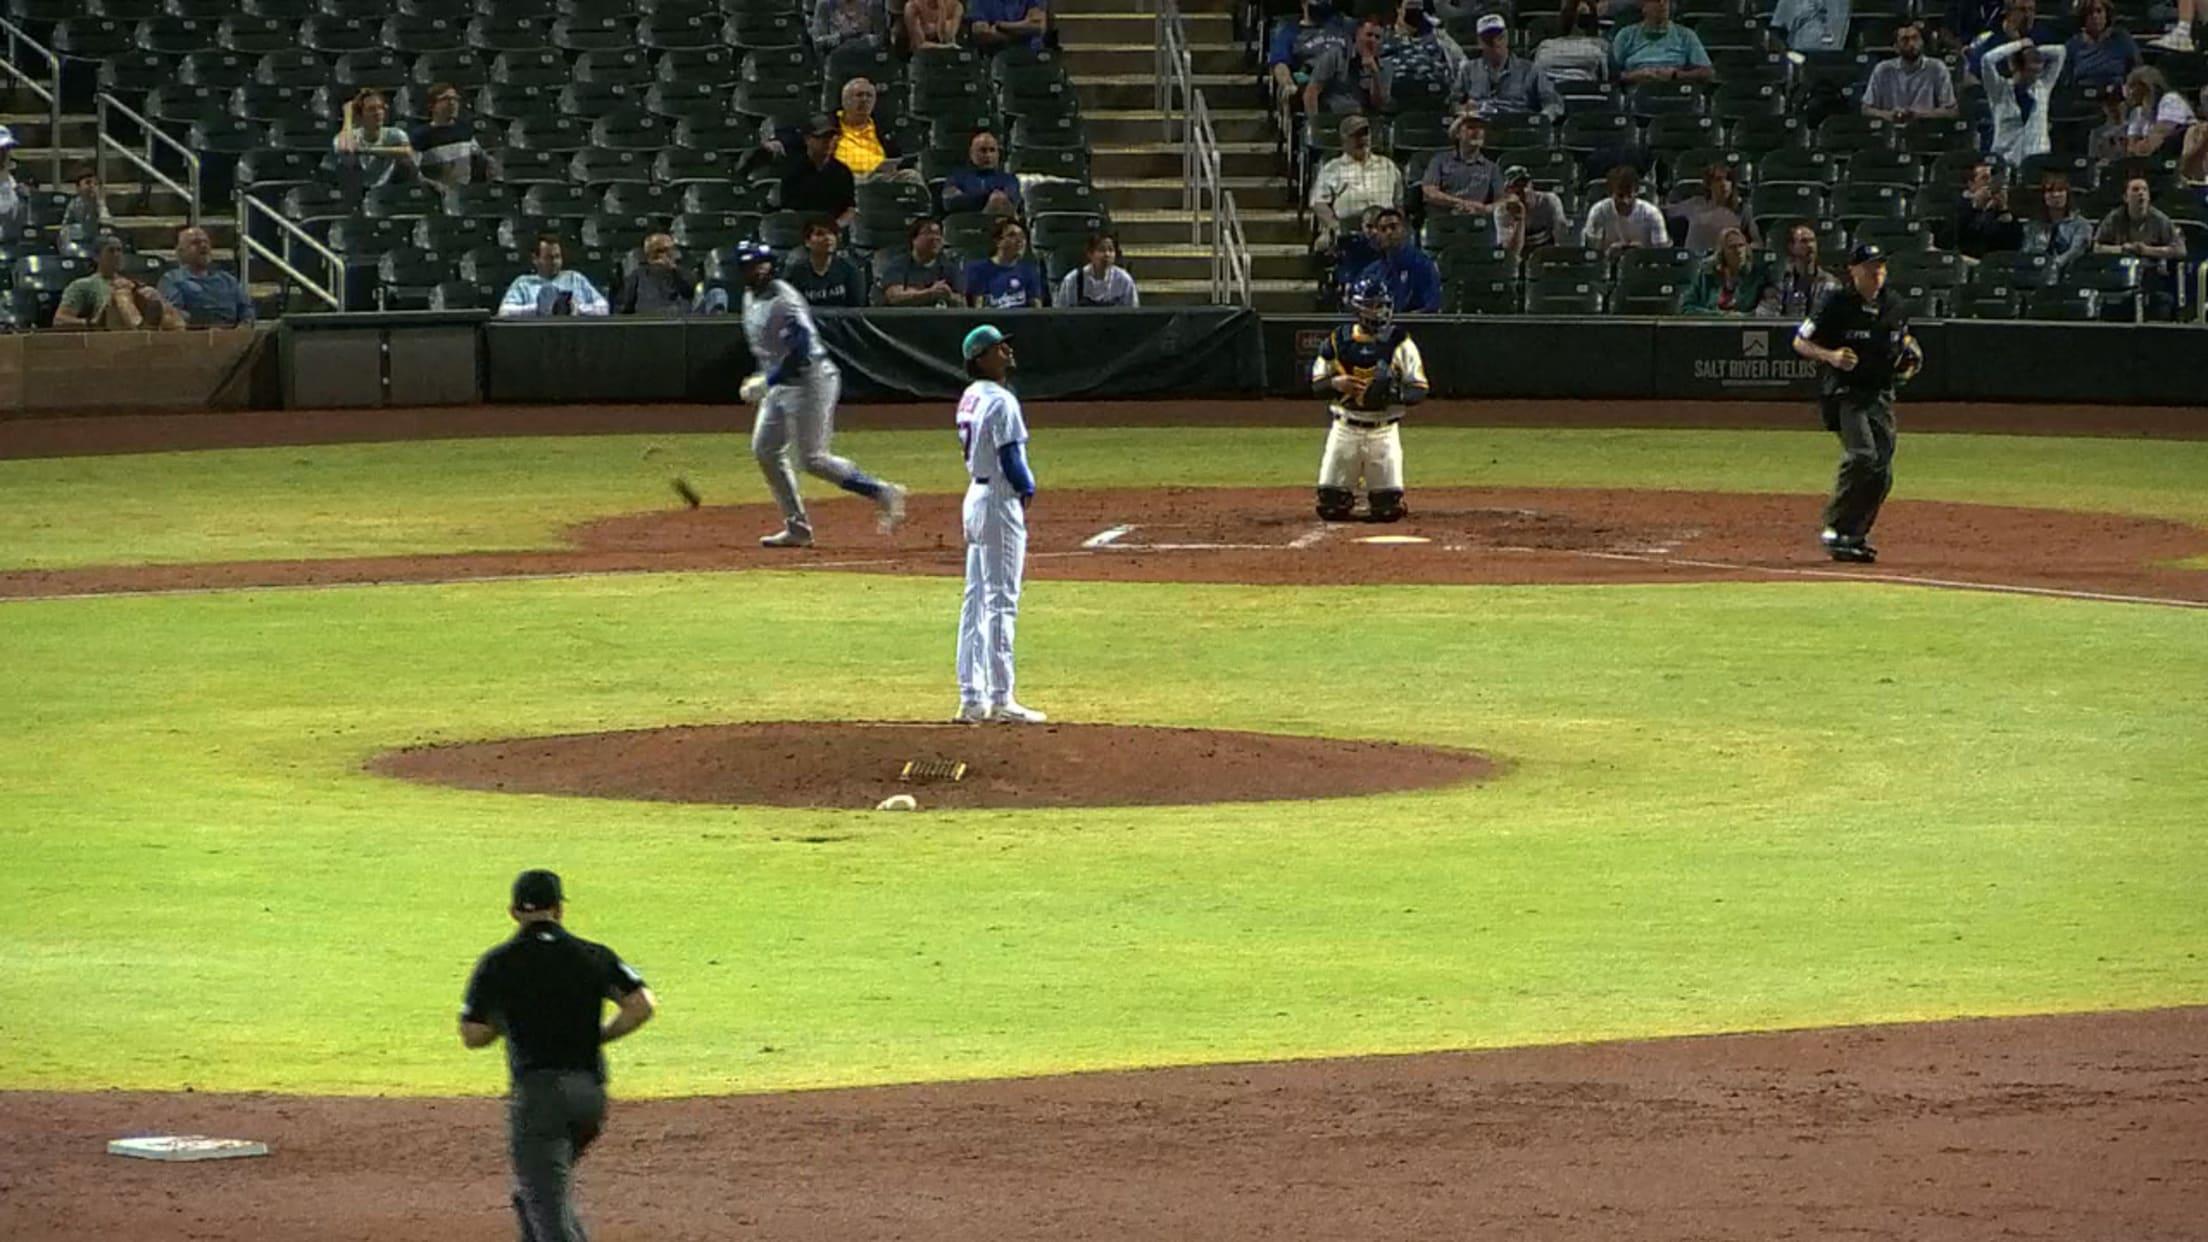 Nelson Velazquez's solo home run